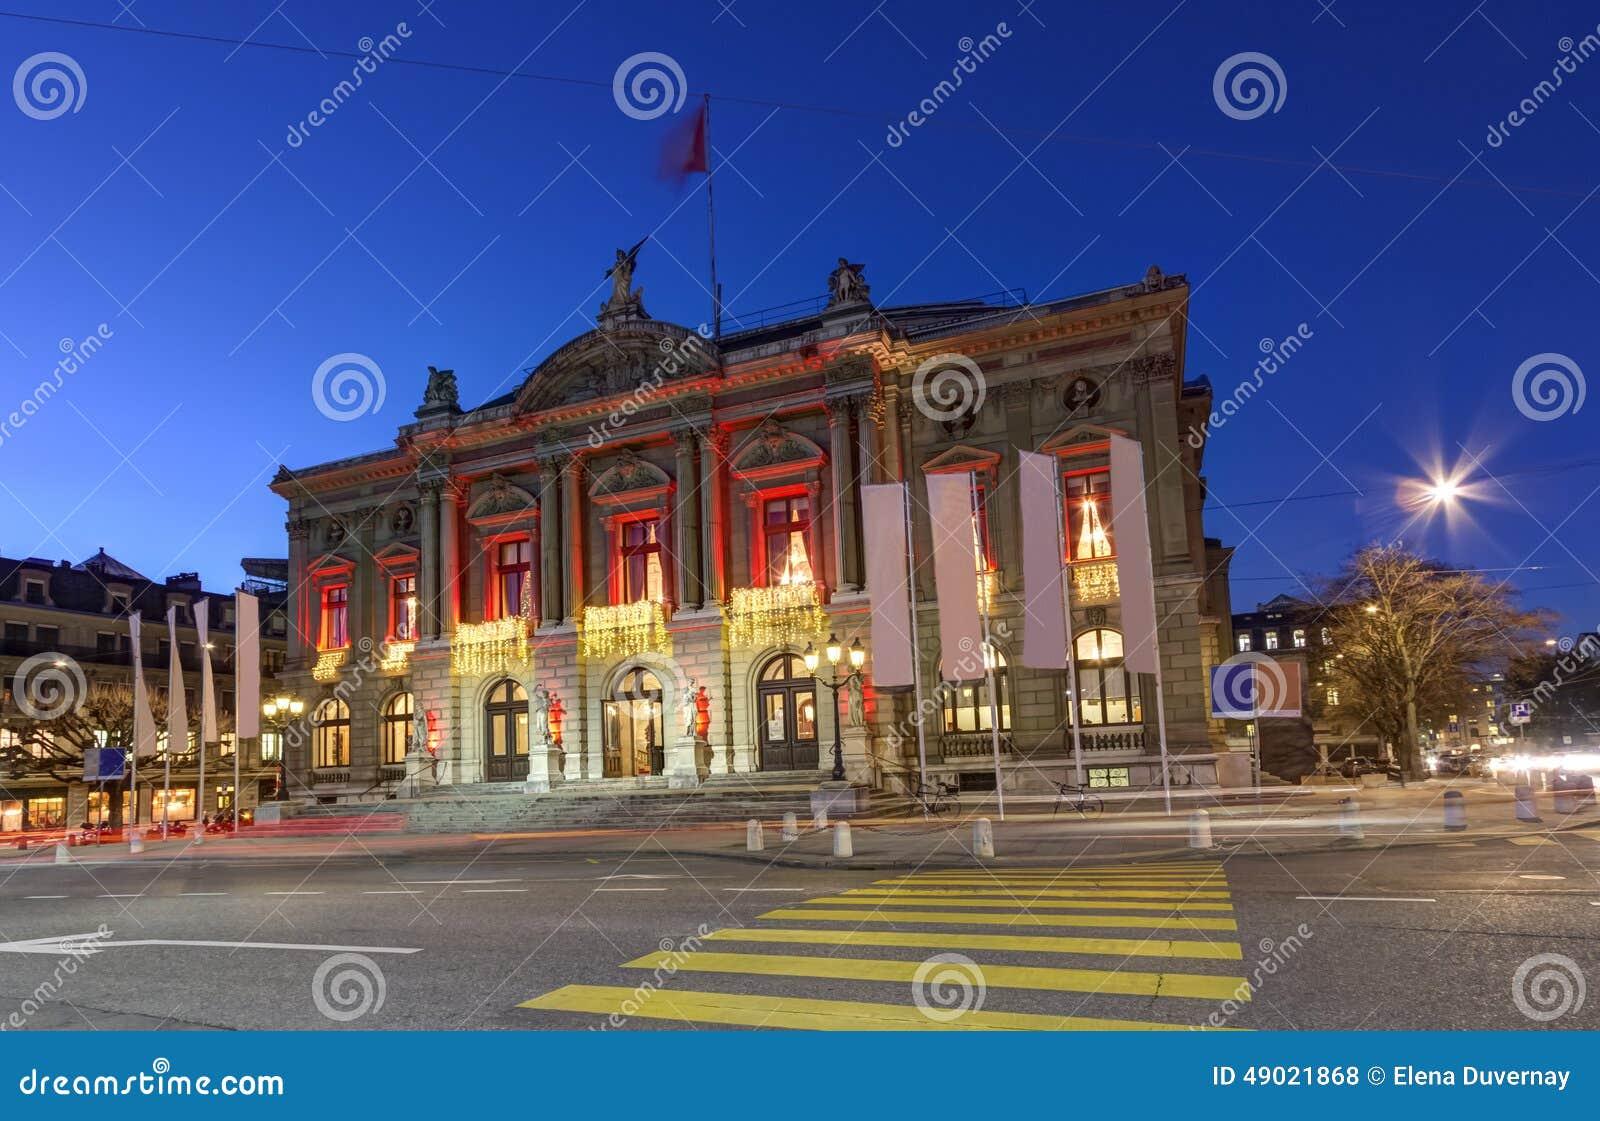 #1041BB Grand Theatre Or Big Theater Geneva Switzerland Stock  5545 decorations noel geneve 1300x928 px @ aertt.com